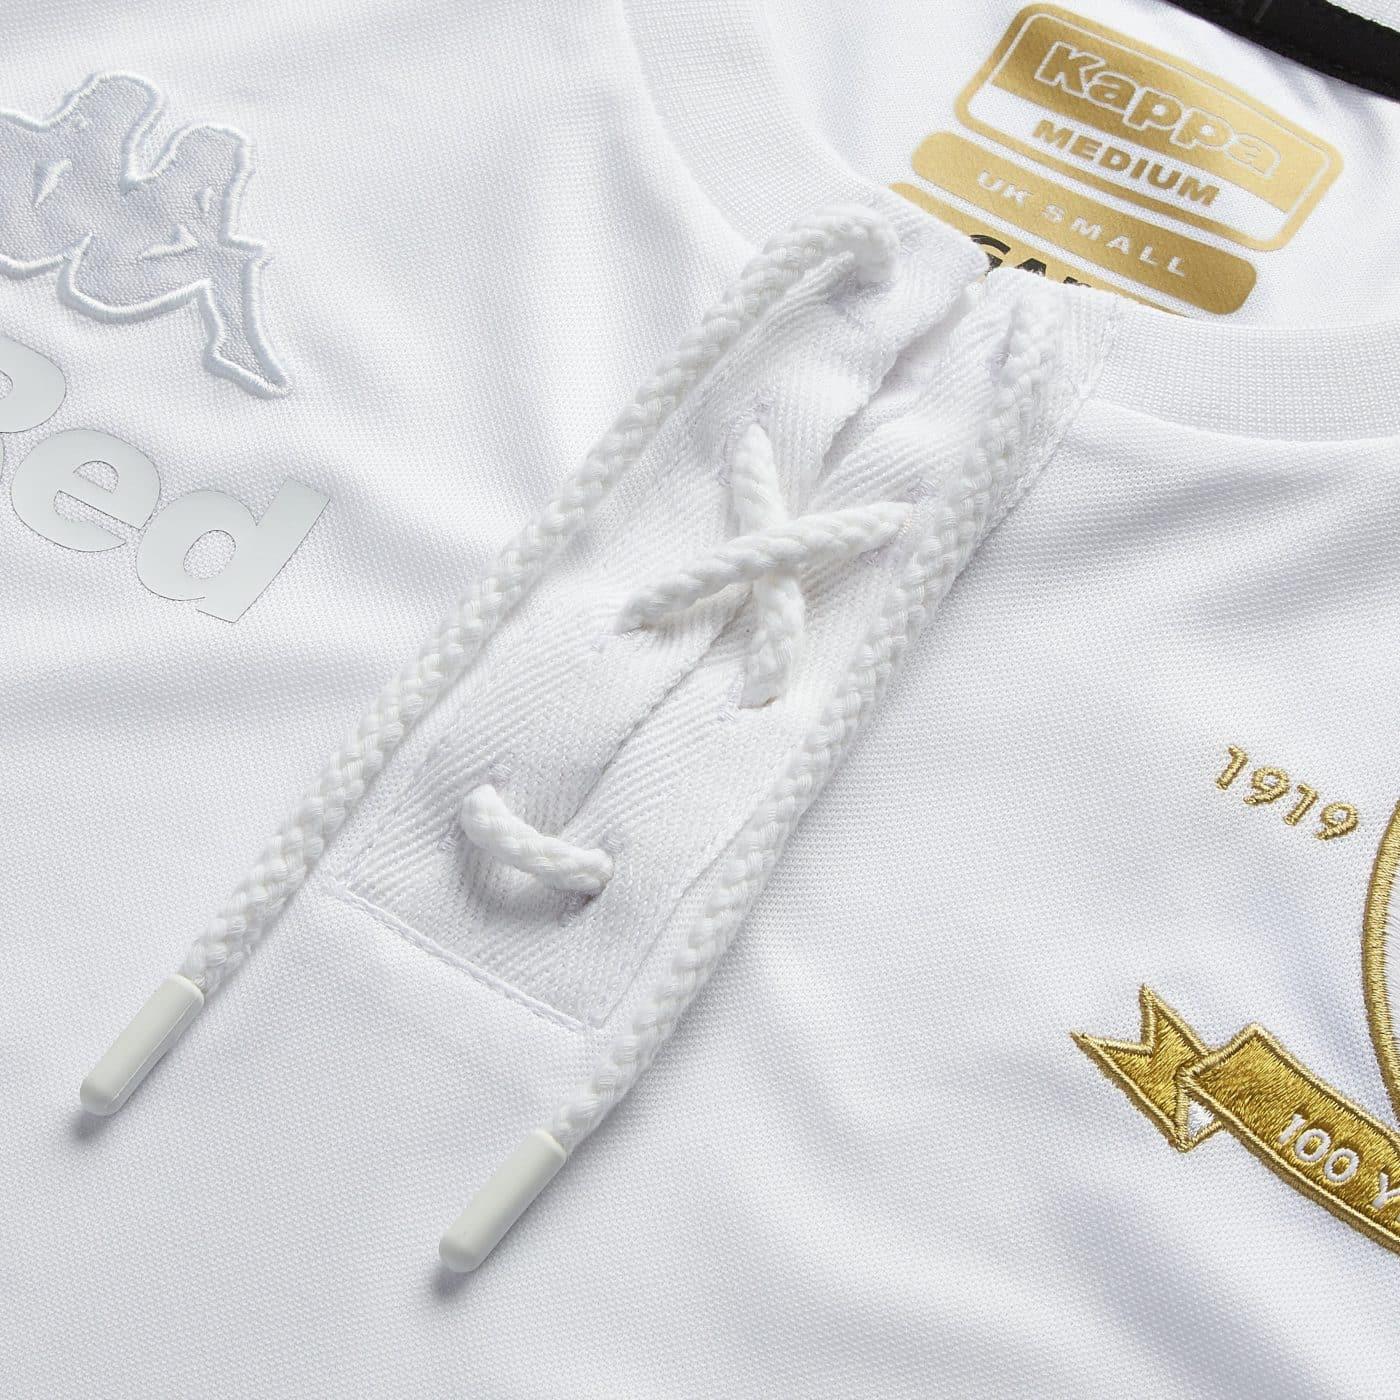 maillot-leeds-united-100-ans-kappa-2